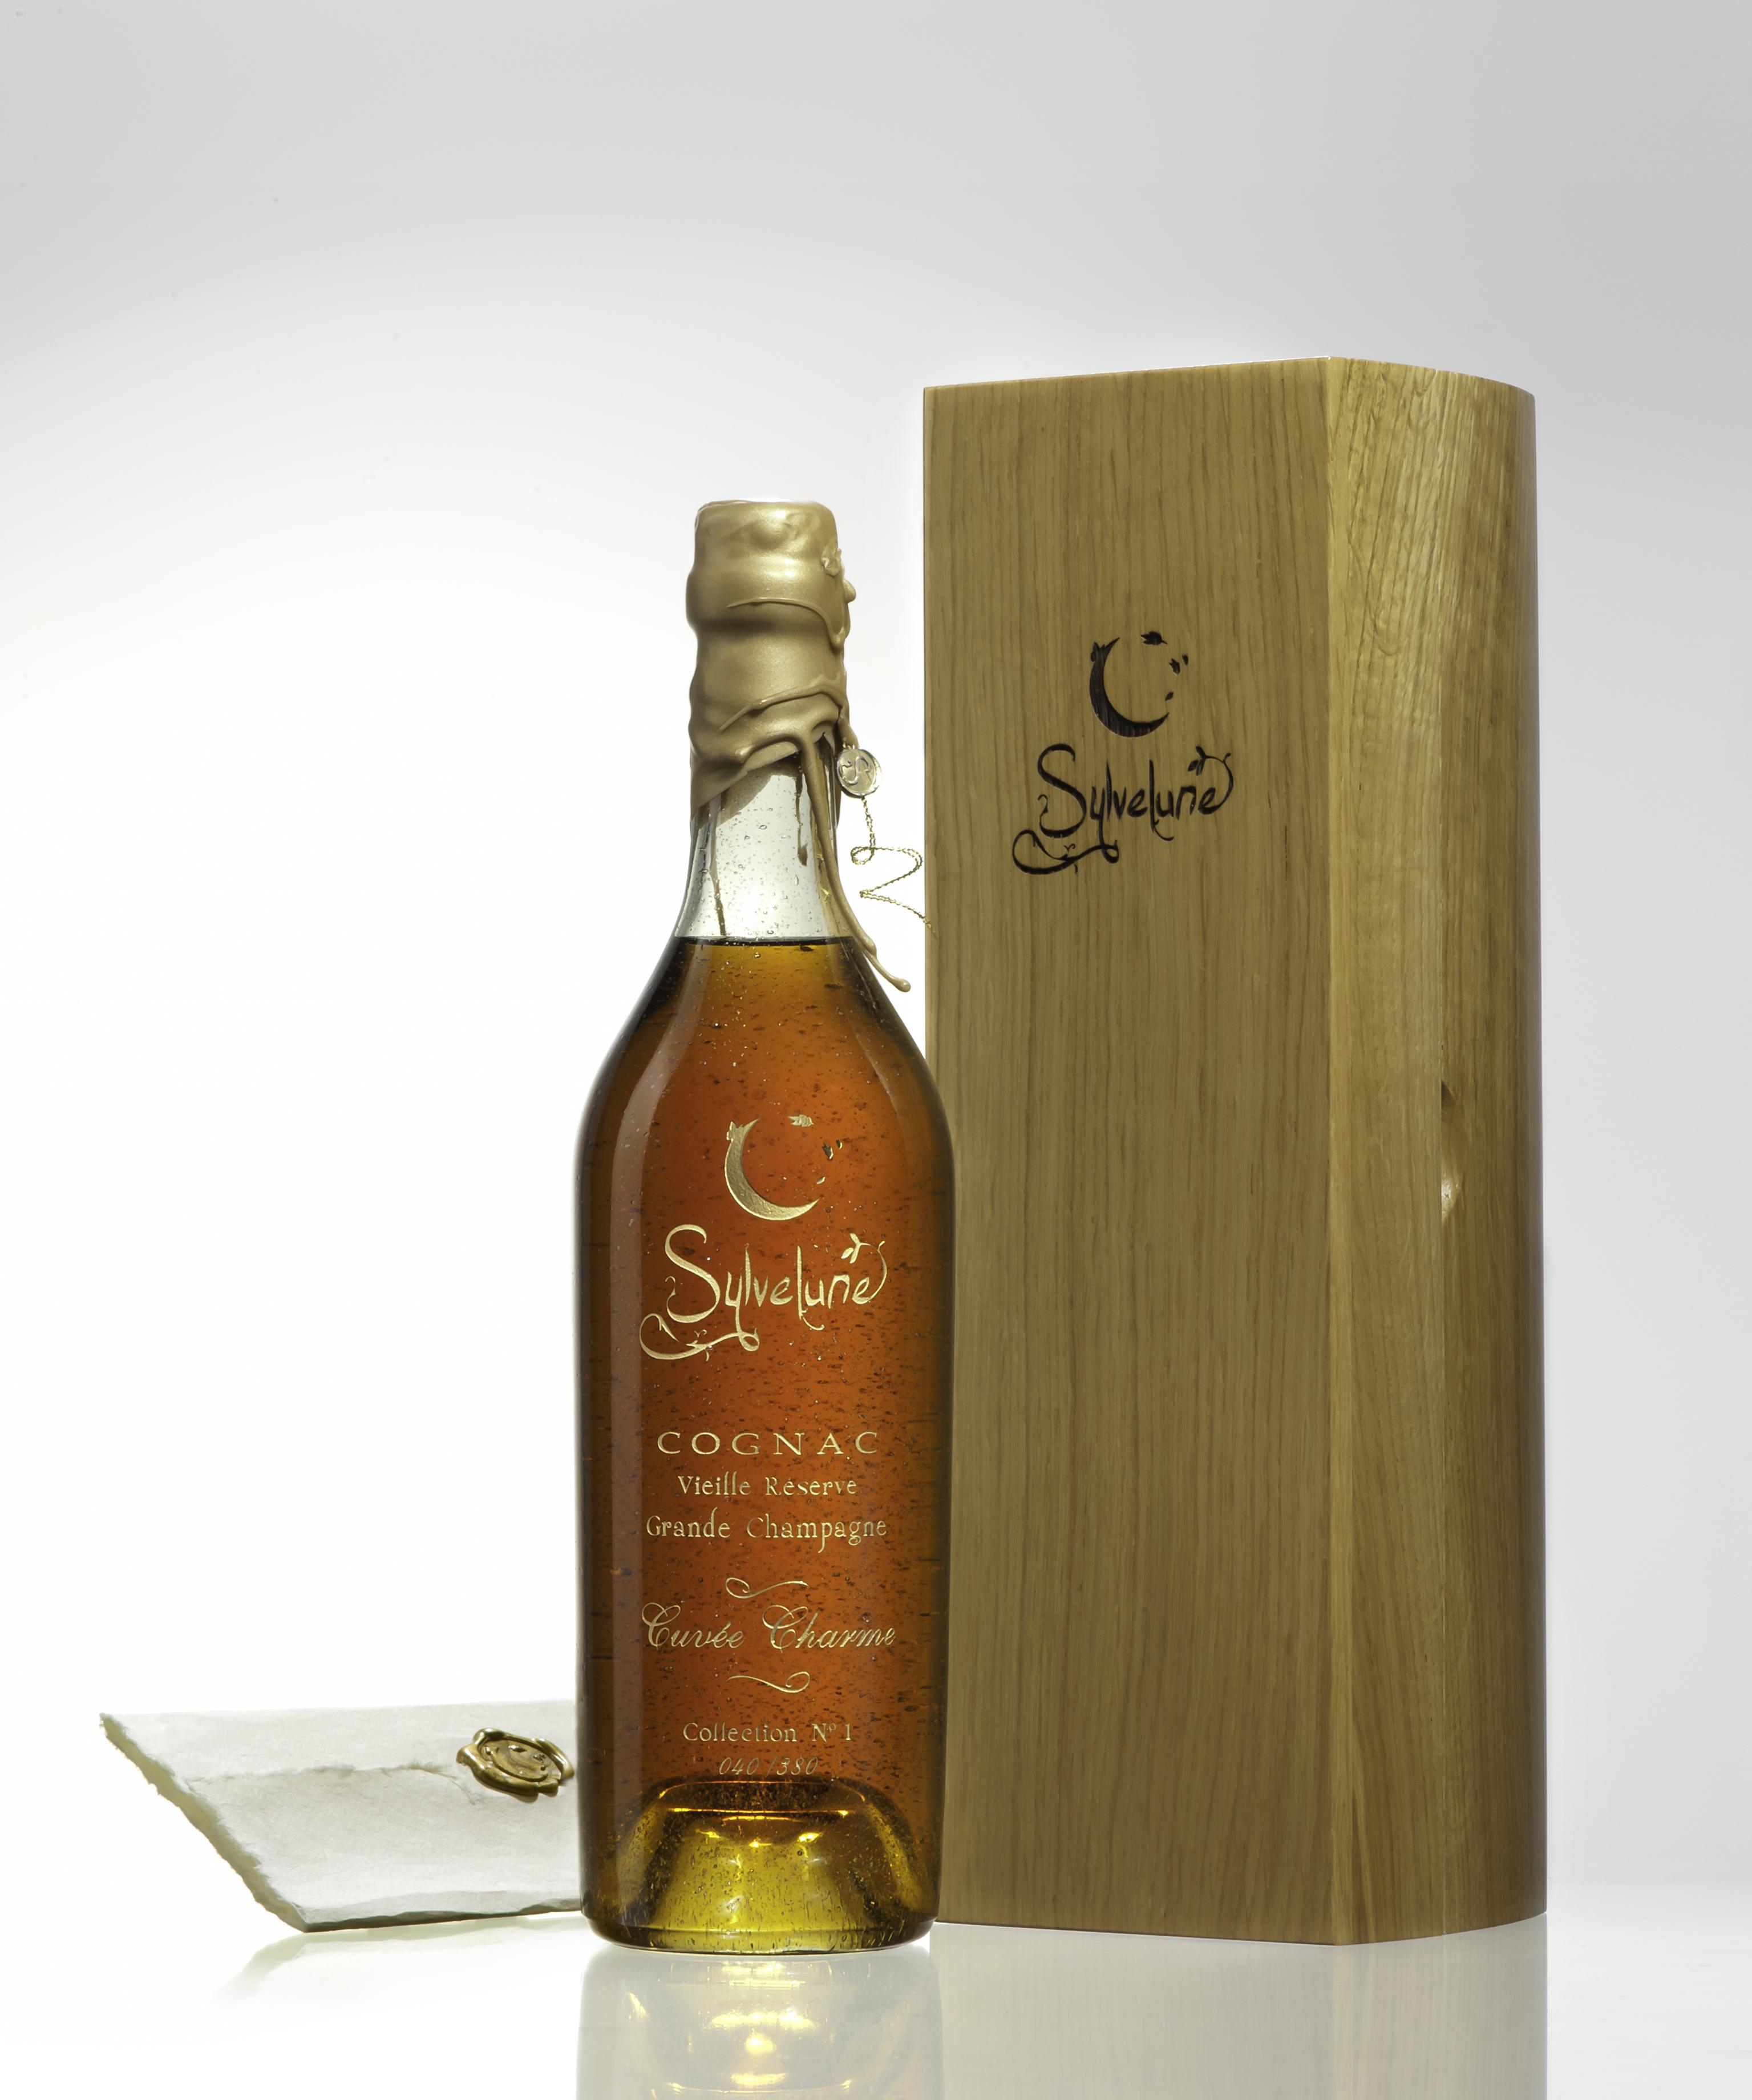 Sylvelune Cognac